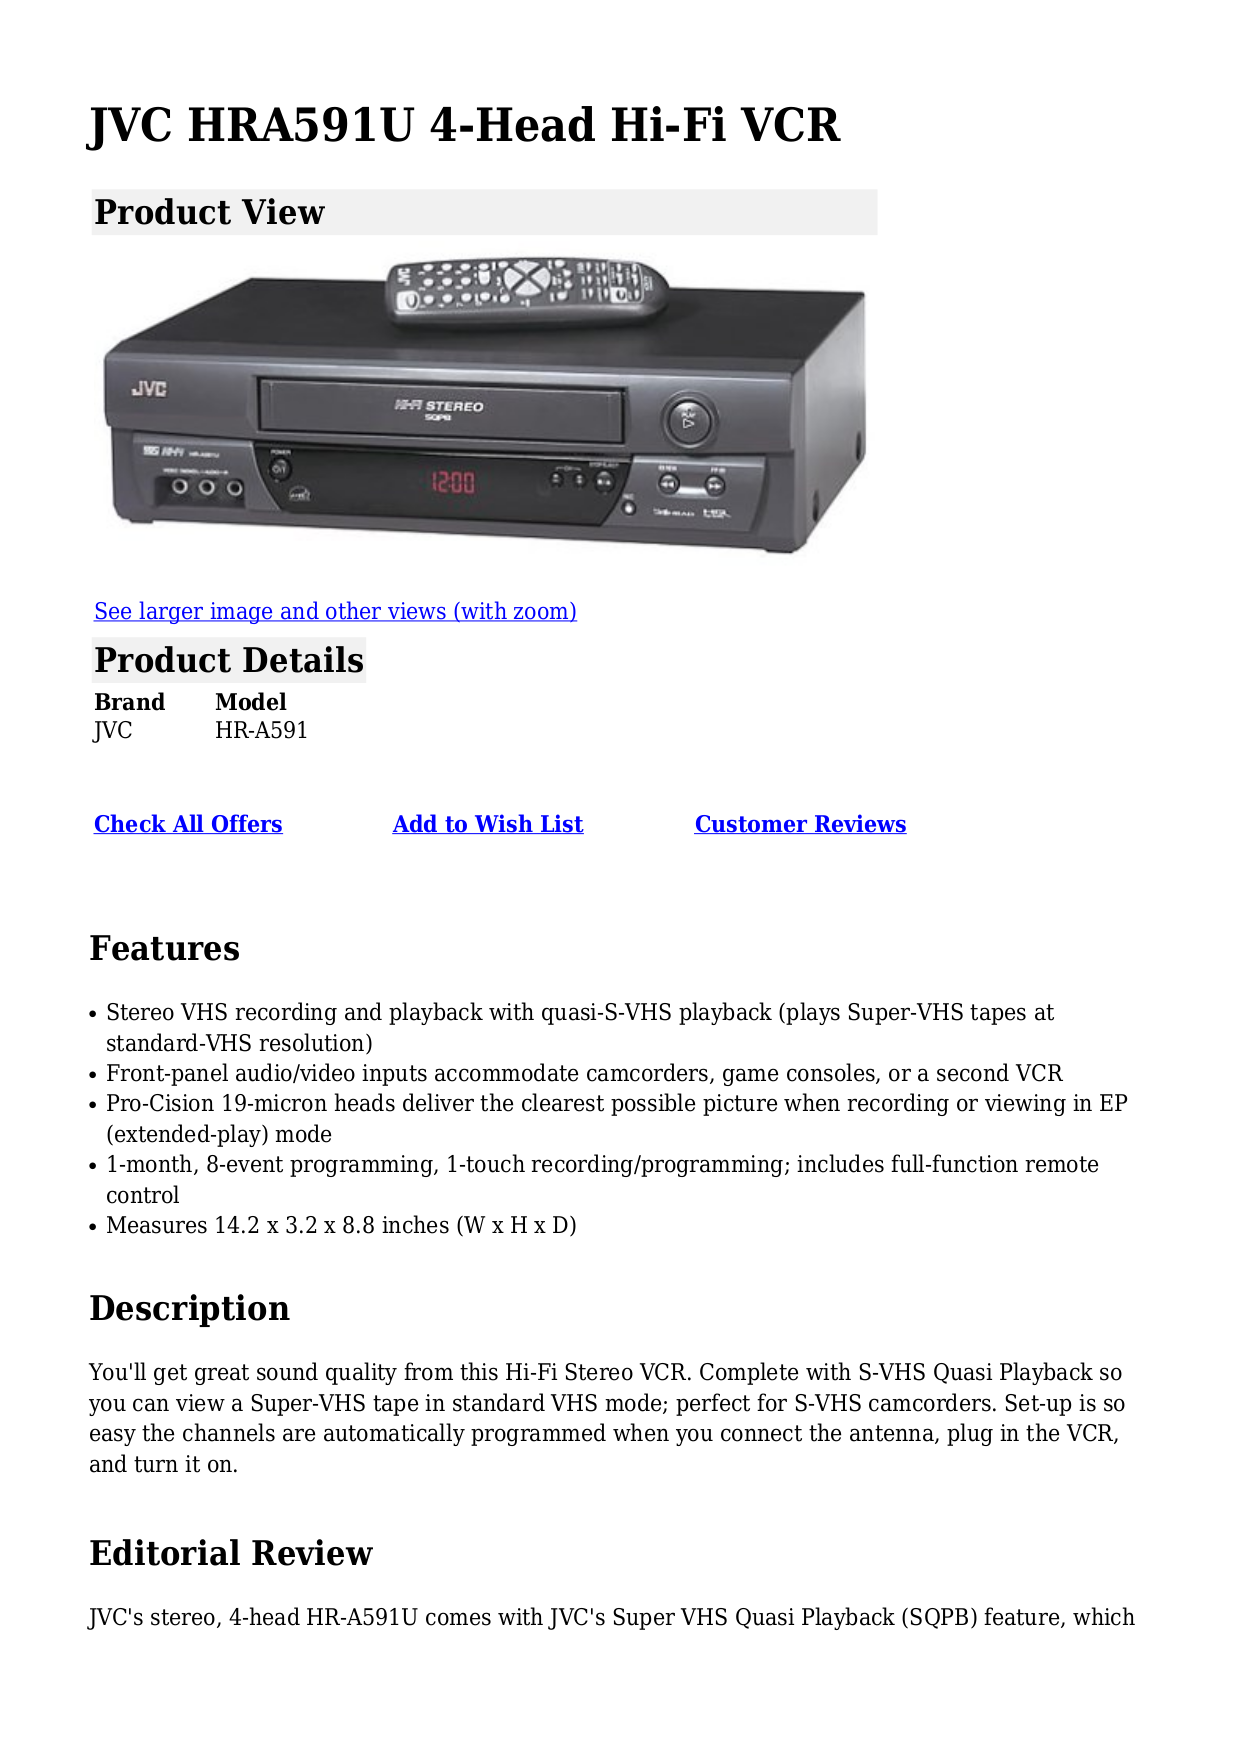 download free pdf for jvc hr a591u vcr manual rh umlib com jvc video recorder manual JVC DVD Recorder with HD